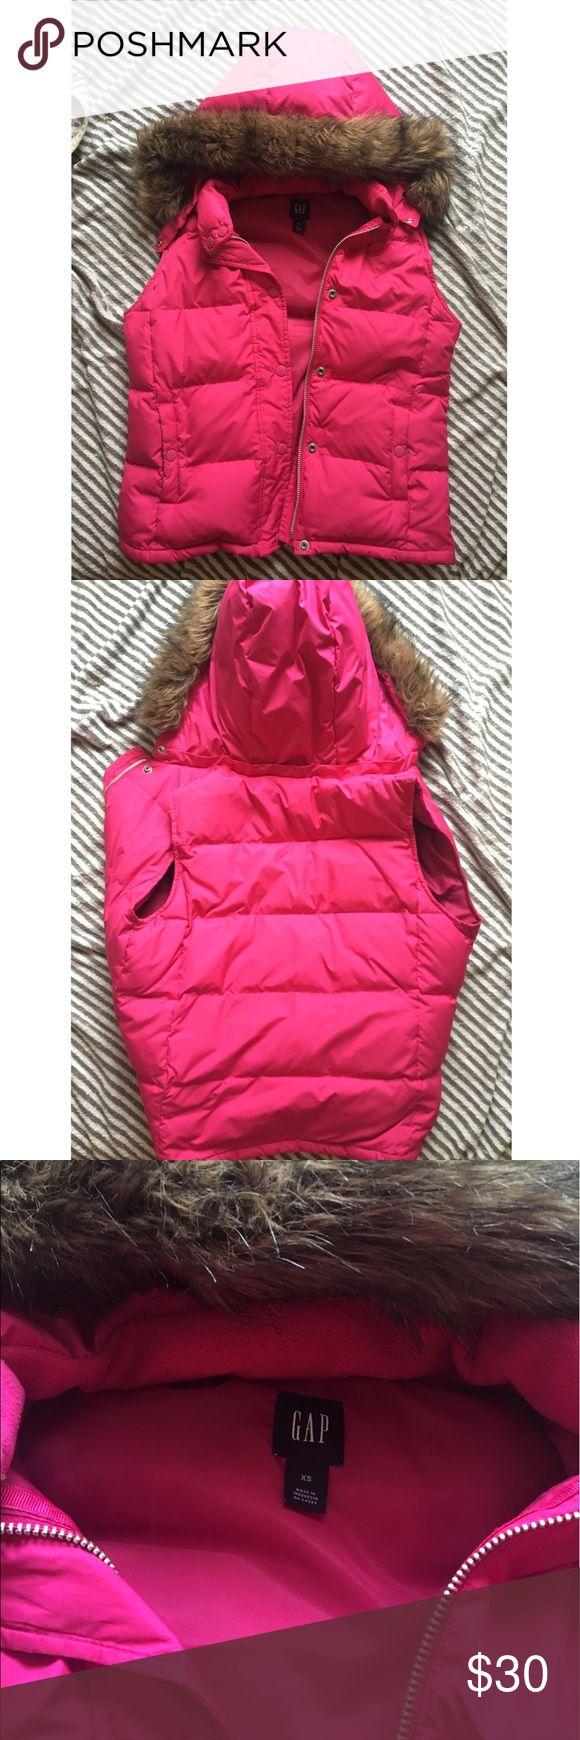 Gap coat size xs Liked new size xs color fucsia GAP Jackets & Coats Utility Jackets